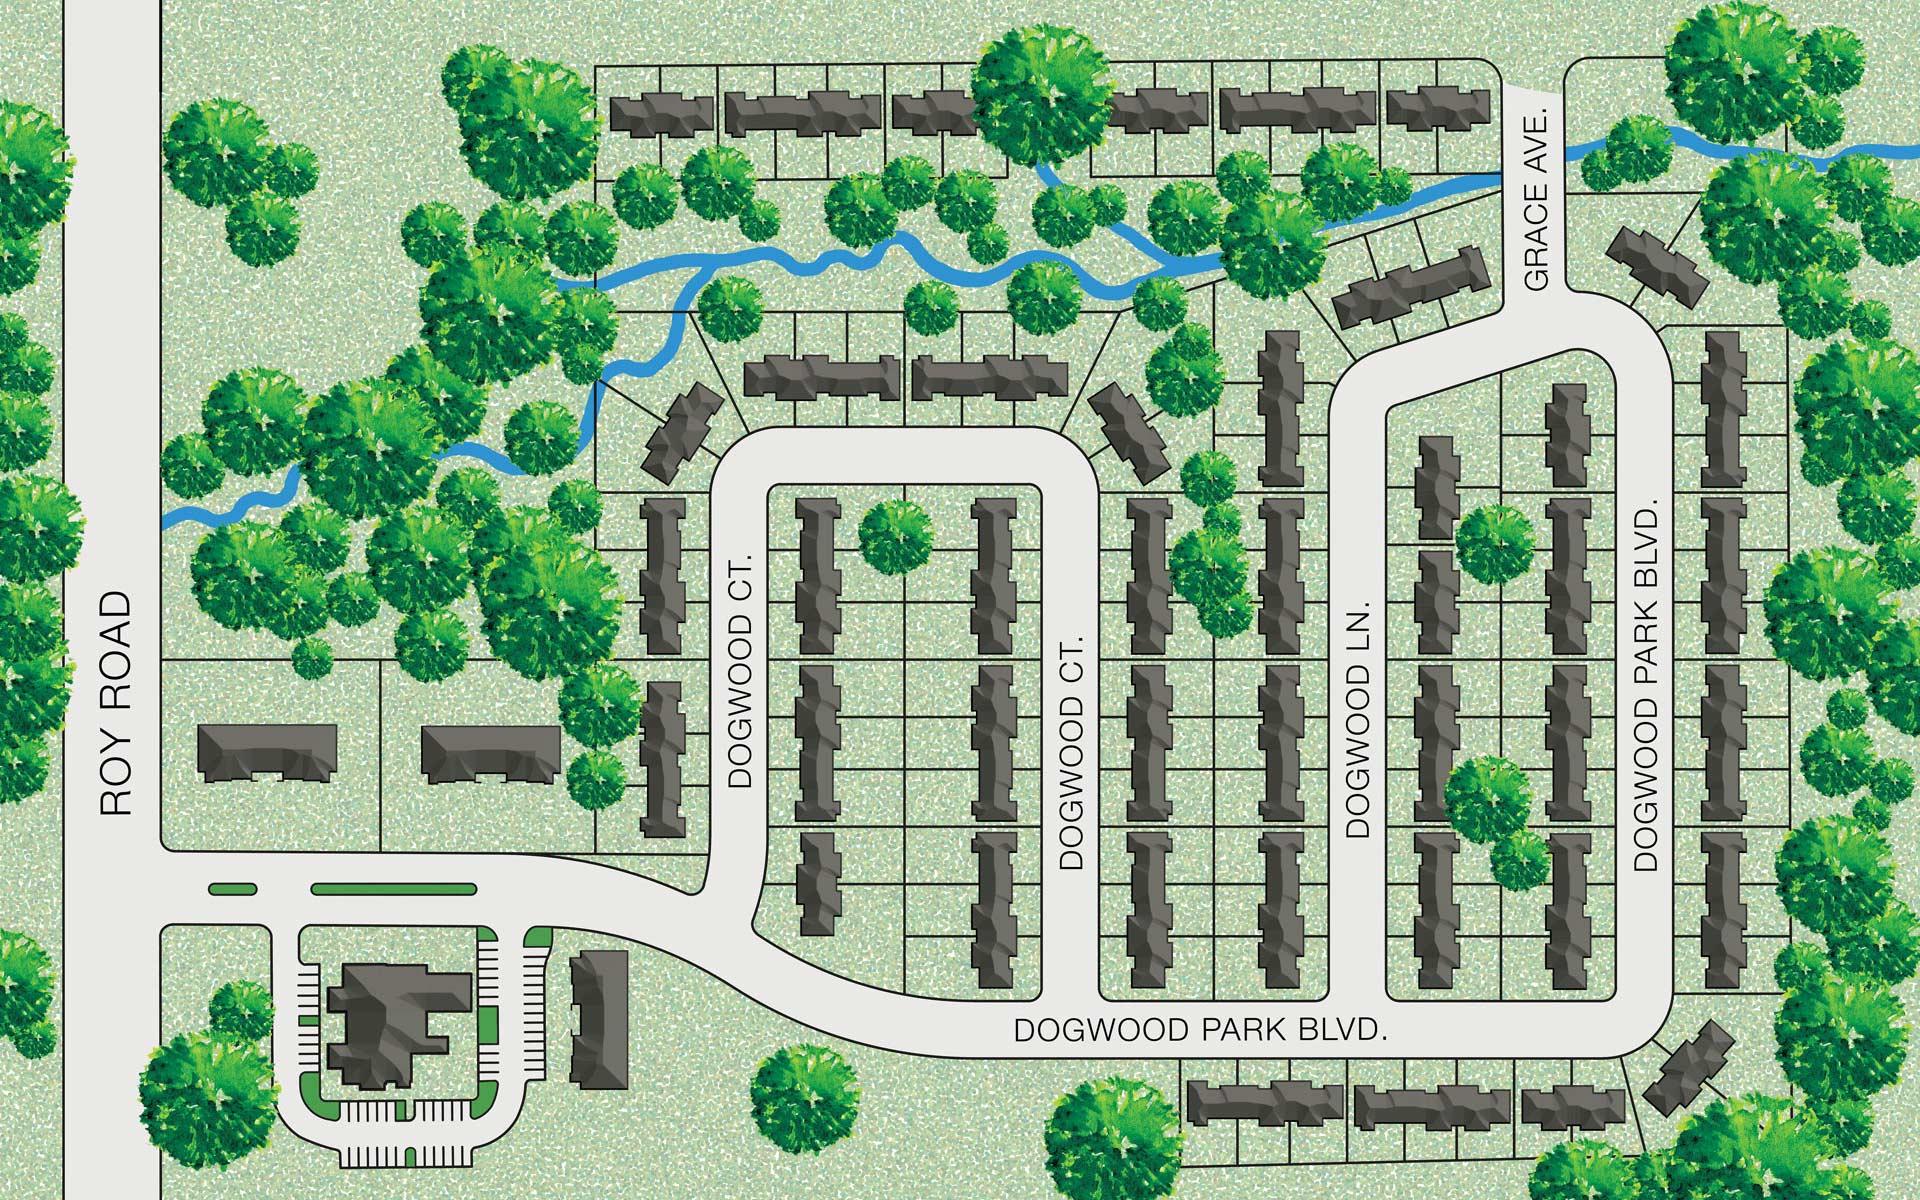 Dogwood Park Site Plan